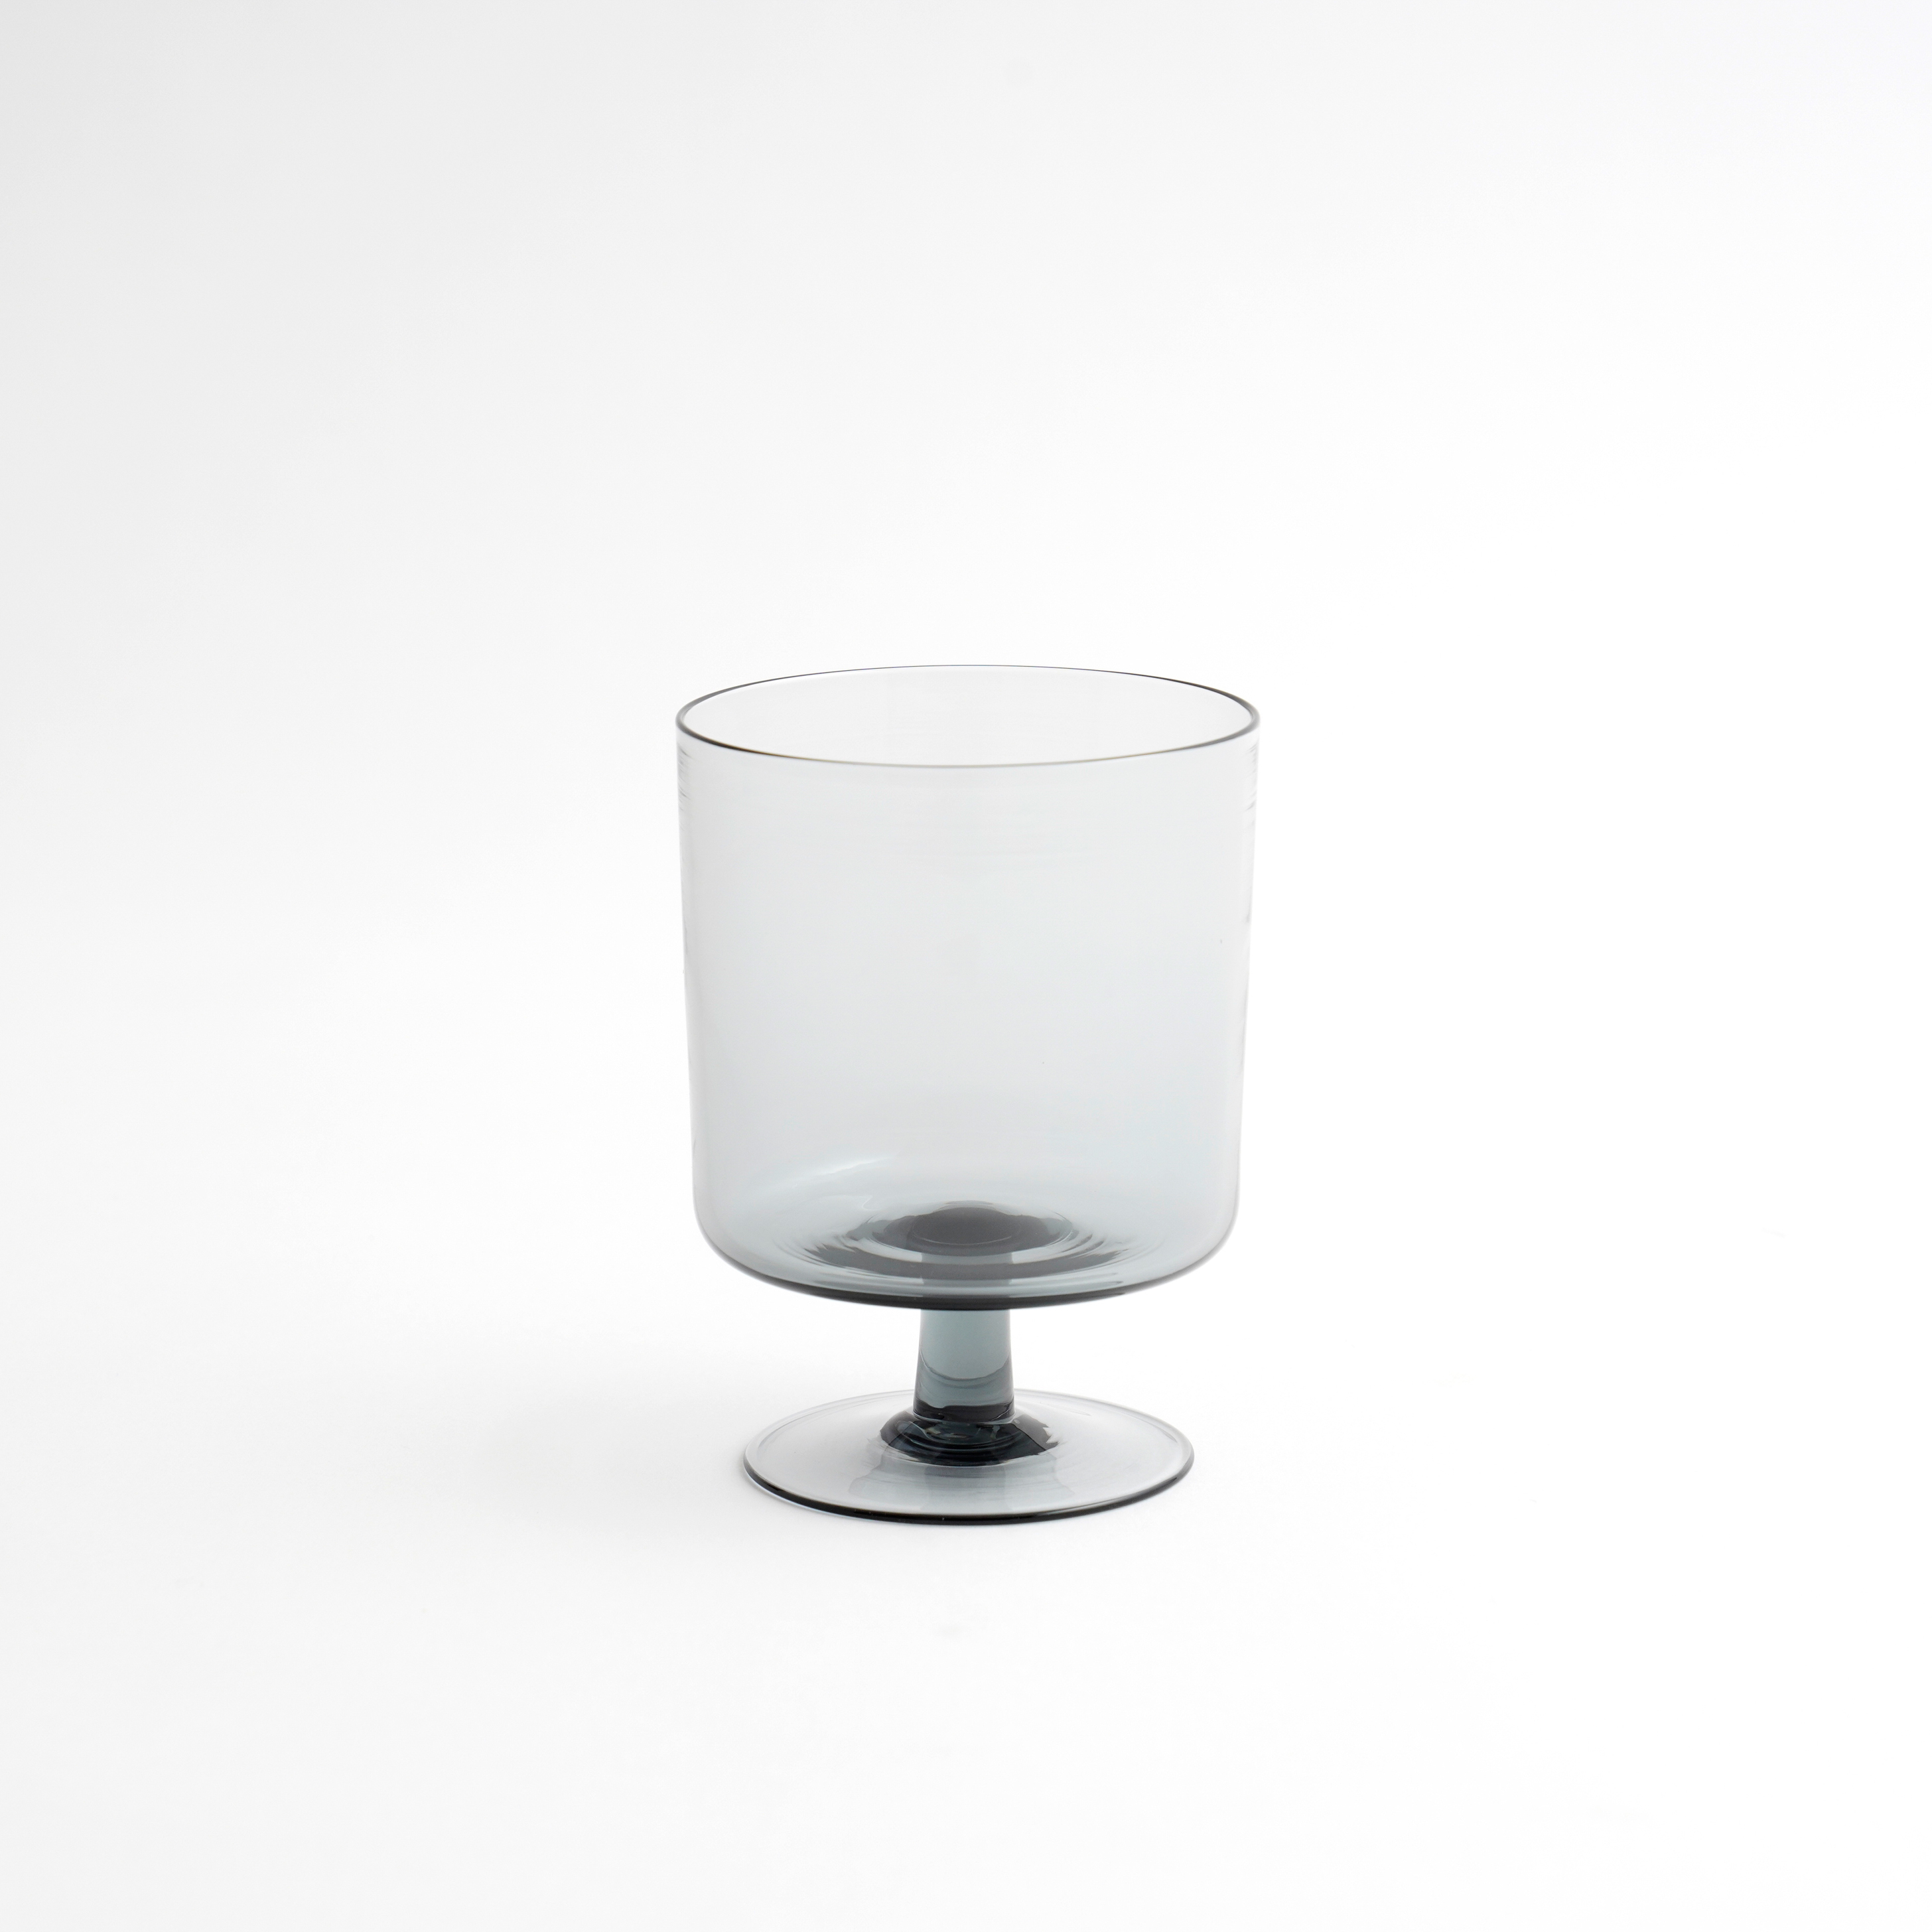 RITOGLASS/ワイングラス/グレー